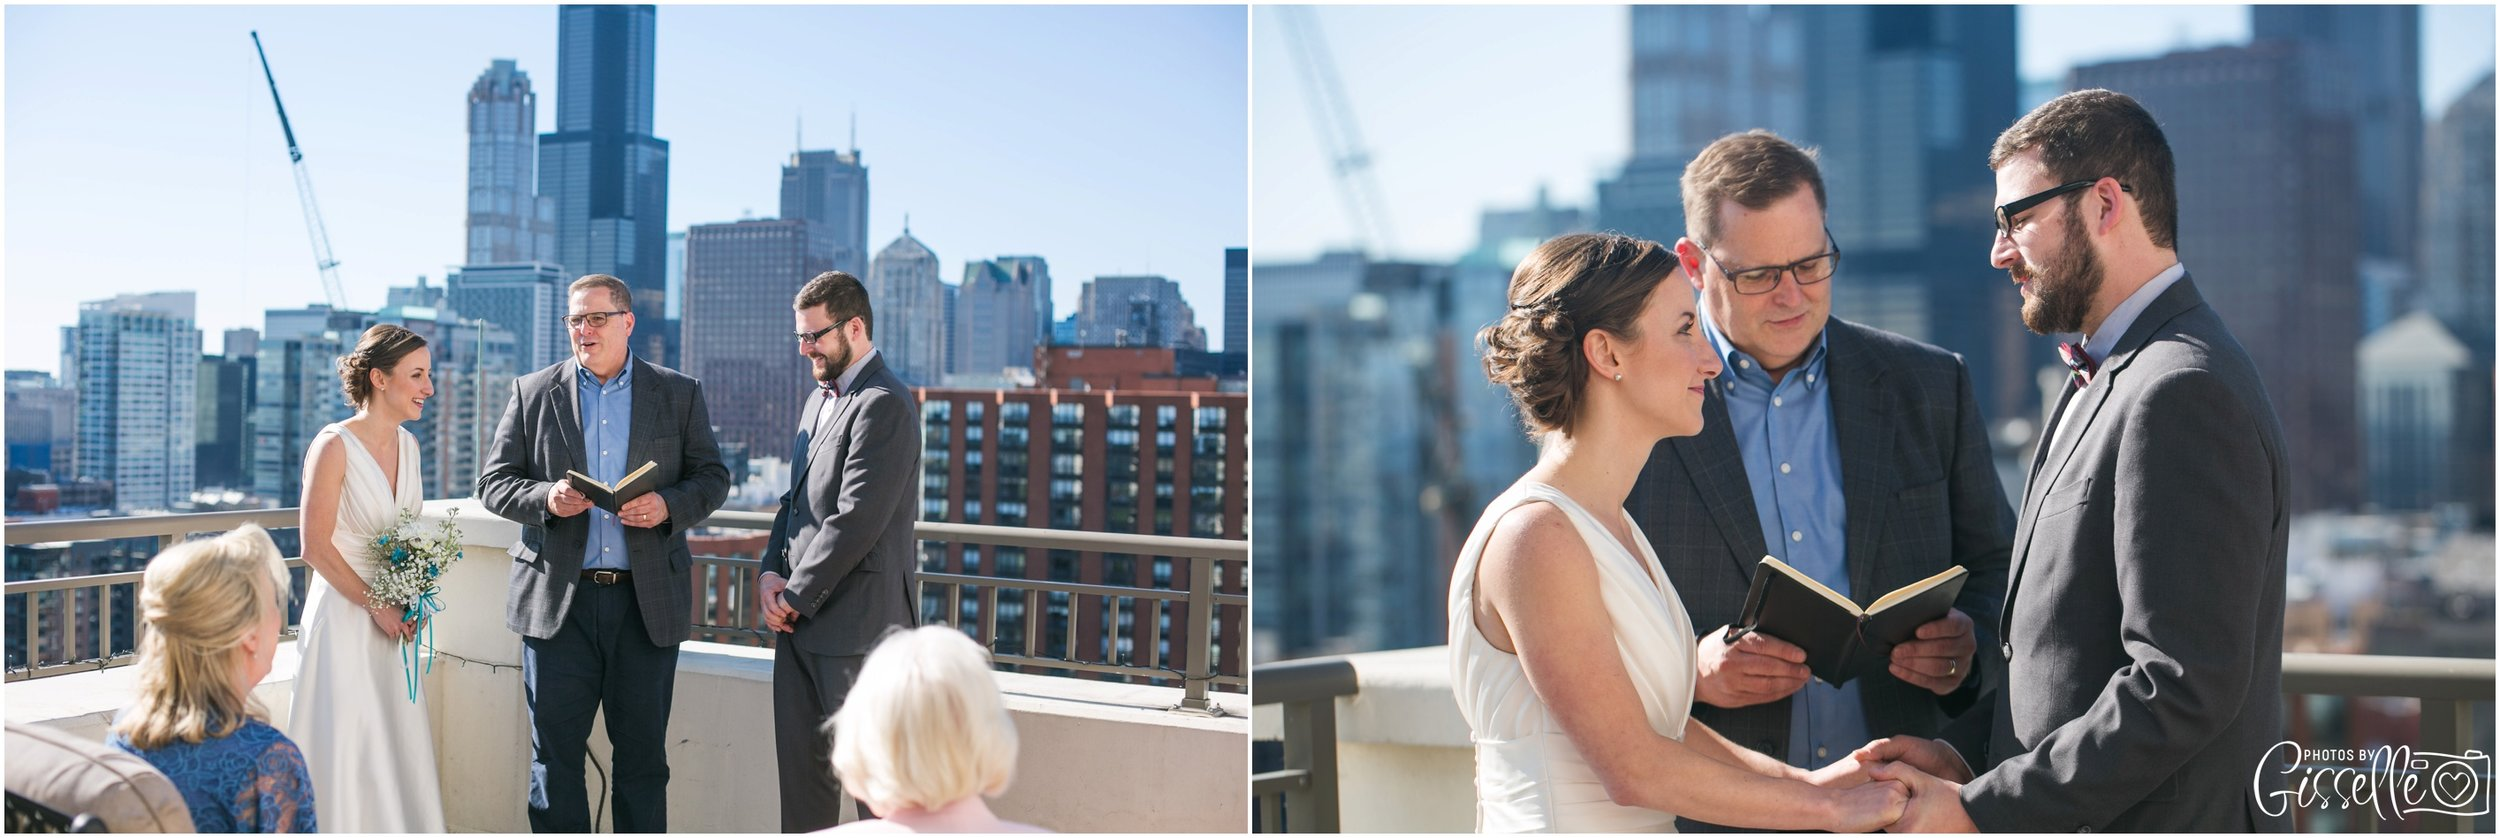 Chicago Rooftop Wedding_0078.jpg